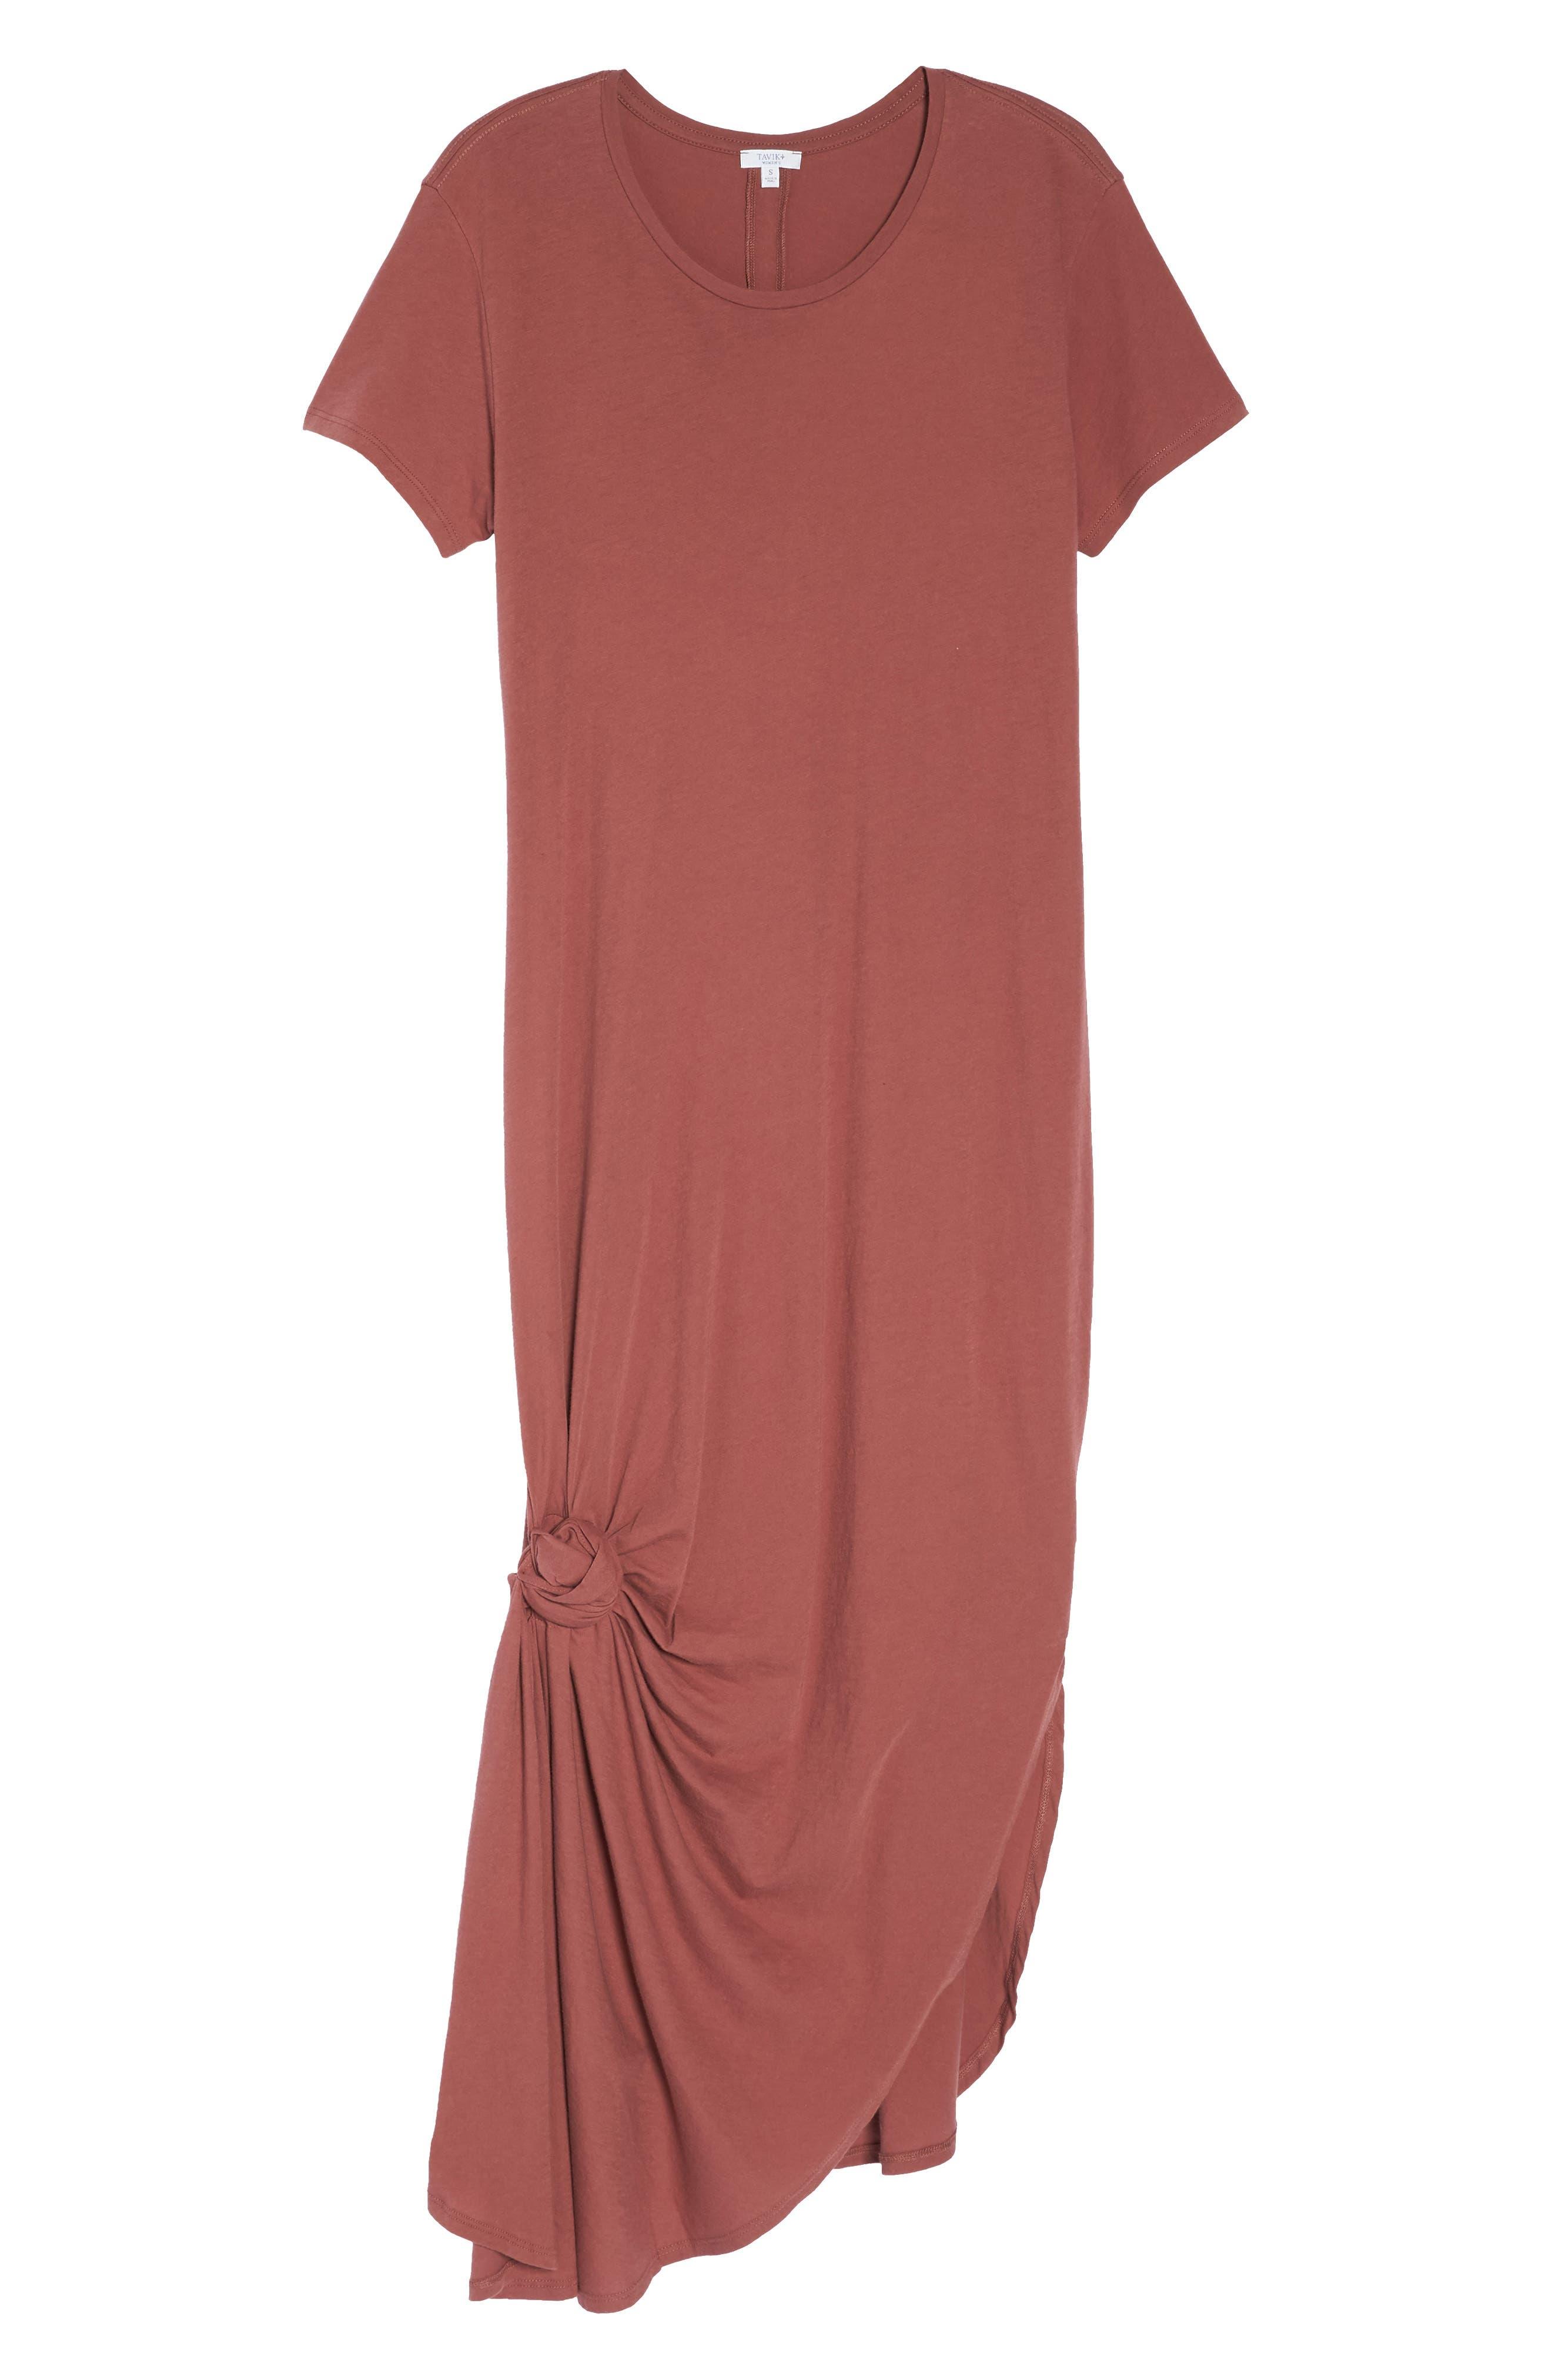 Jones Cover-Up Dress,                             Alternate thumbnail 6, color,                             VINTAGE BERRY